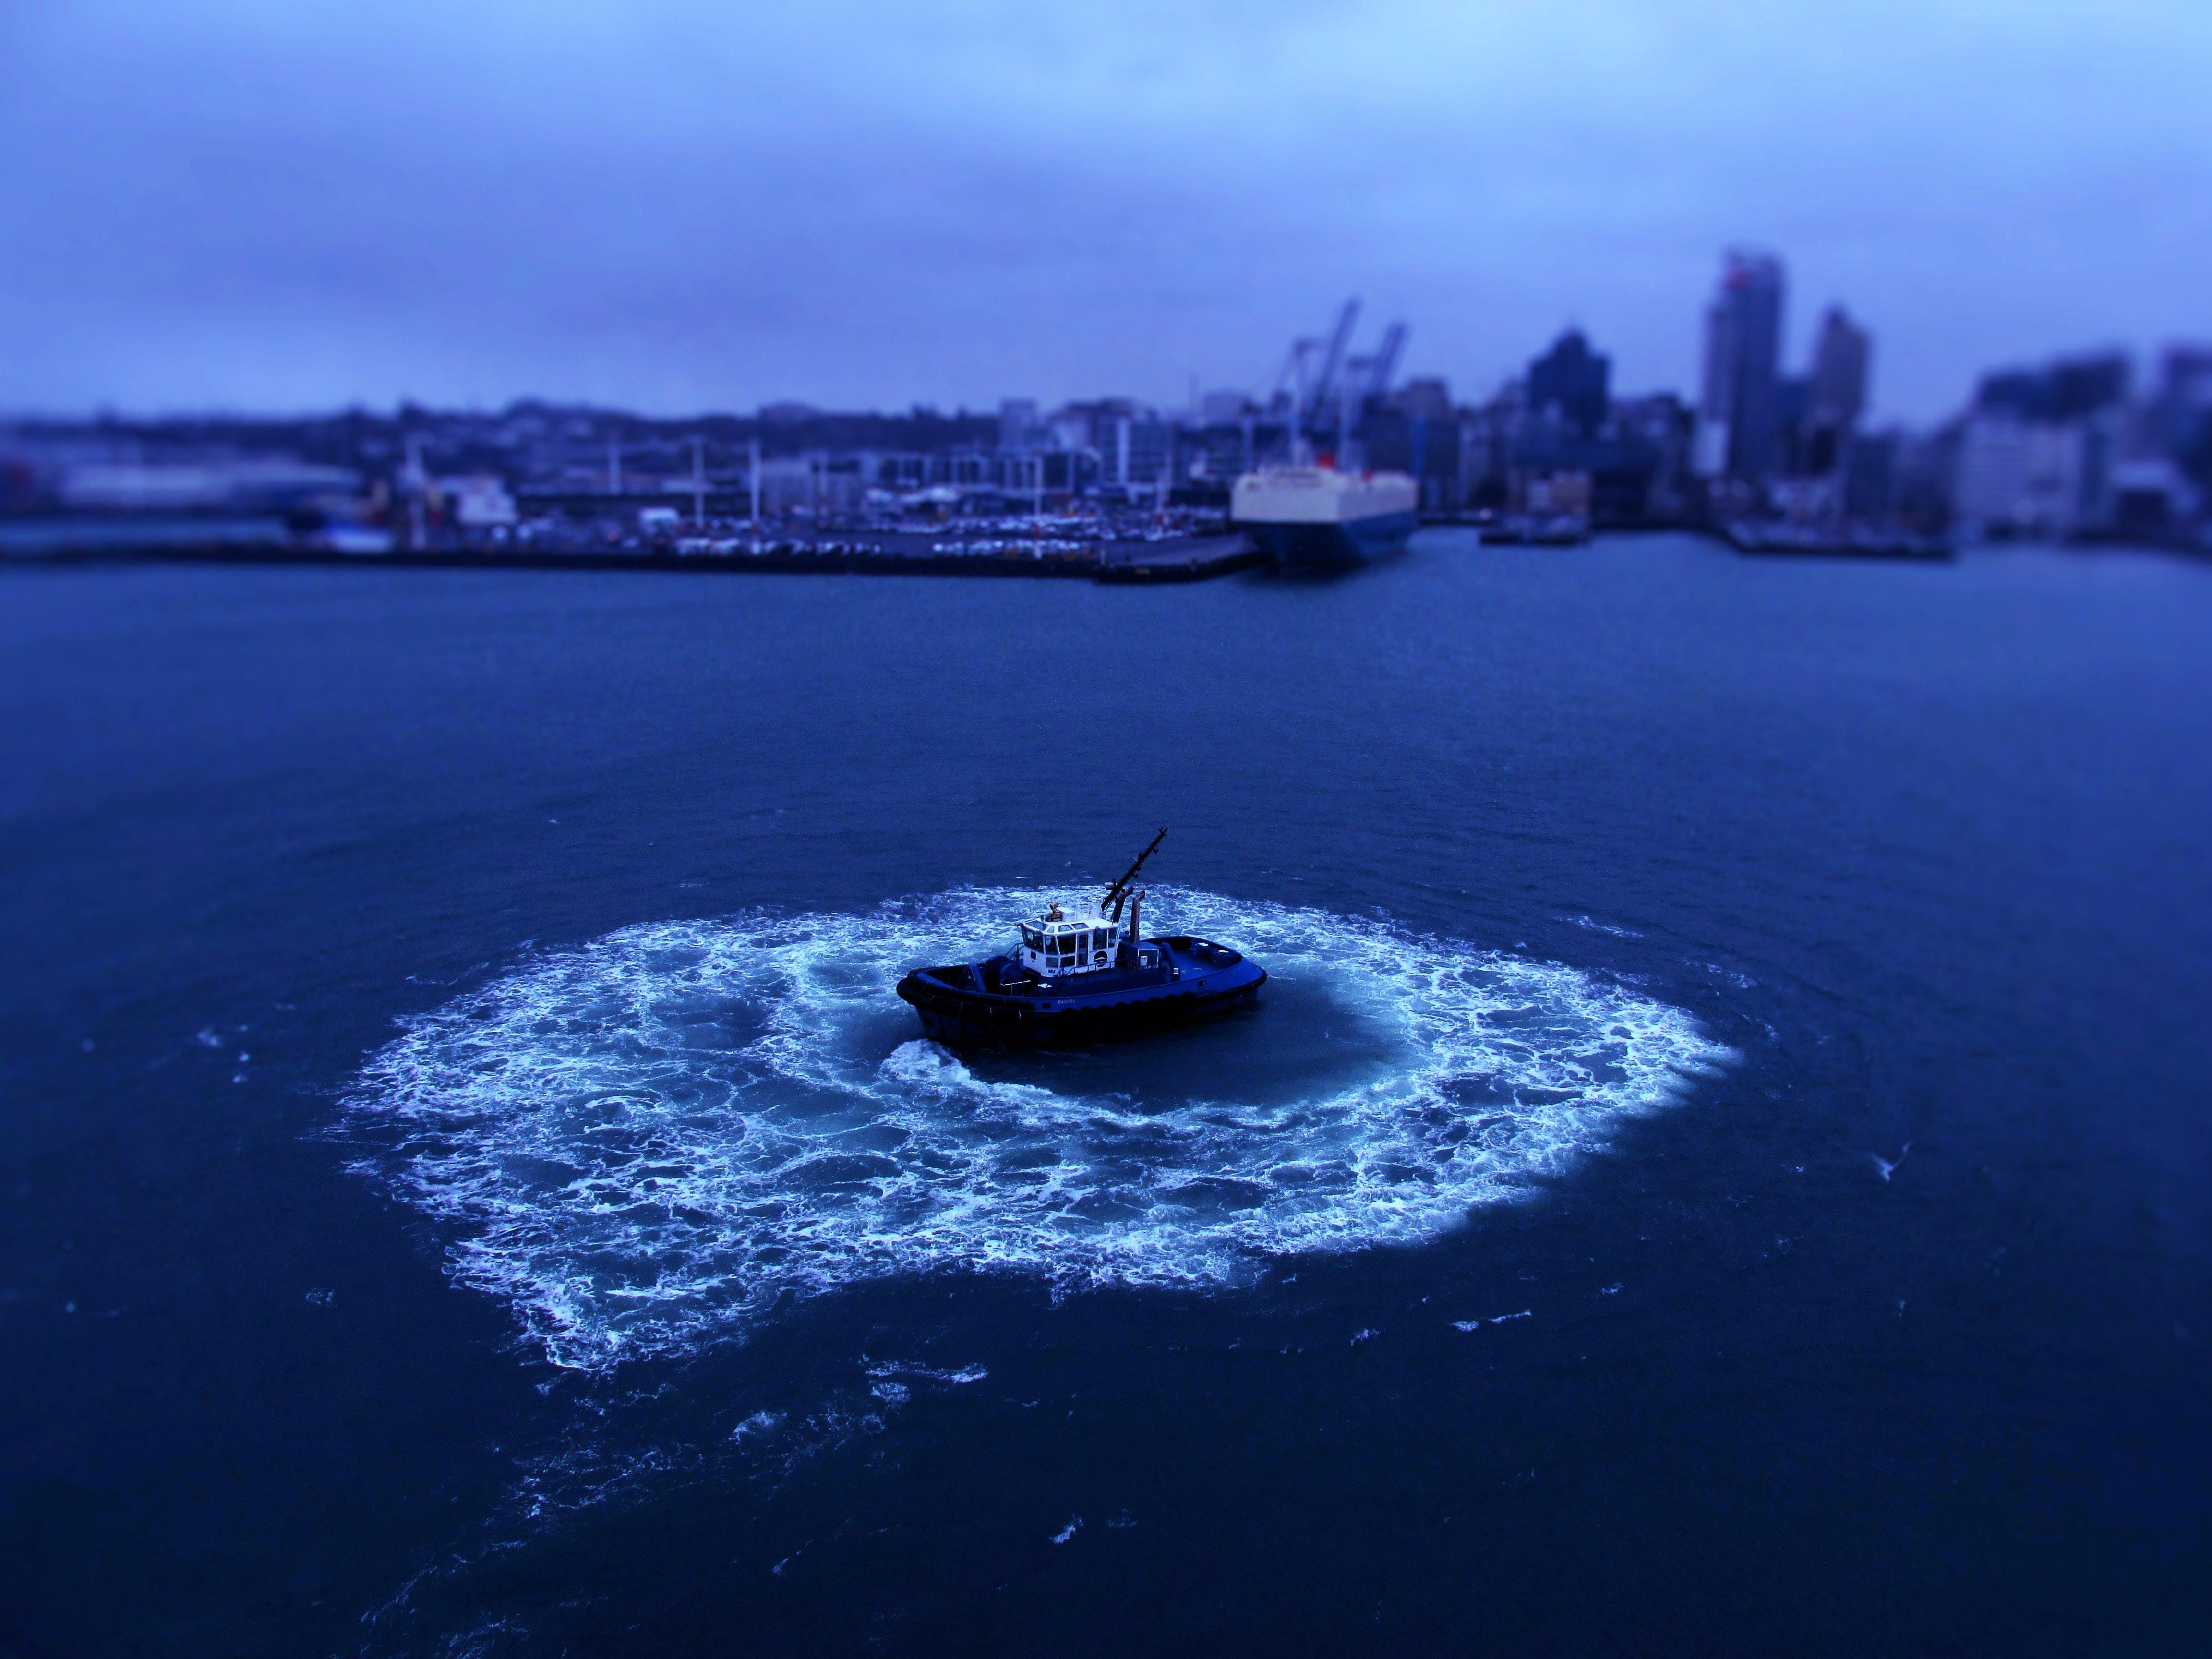 Kostenloses Stock Foto zu blau, boot, fahrzeug, meer